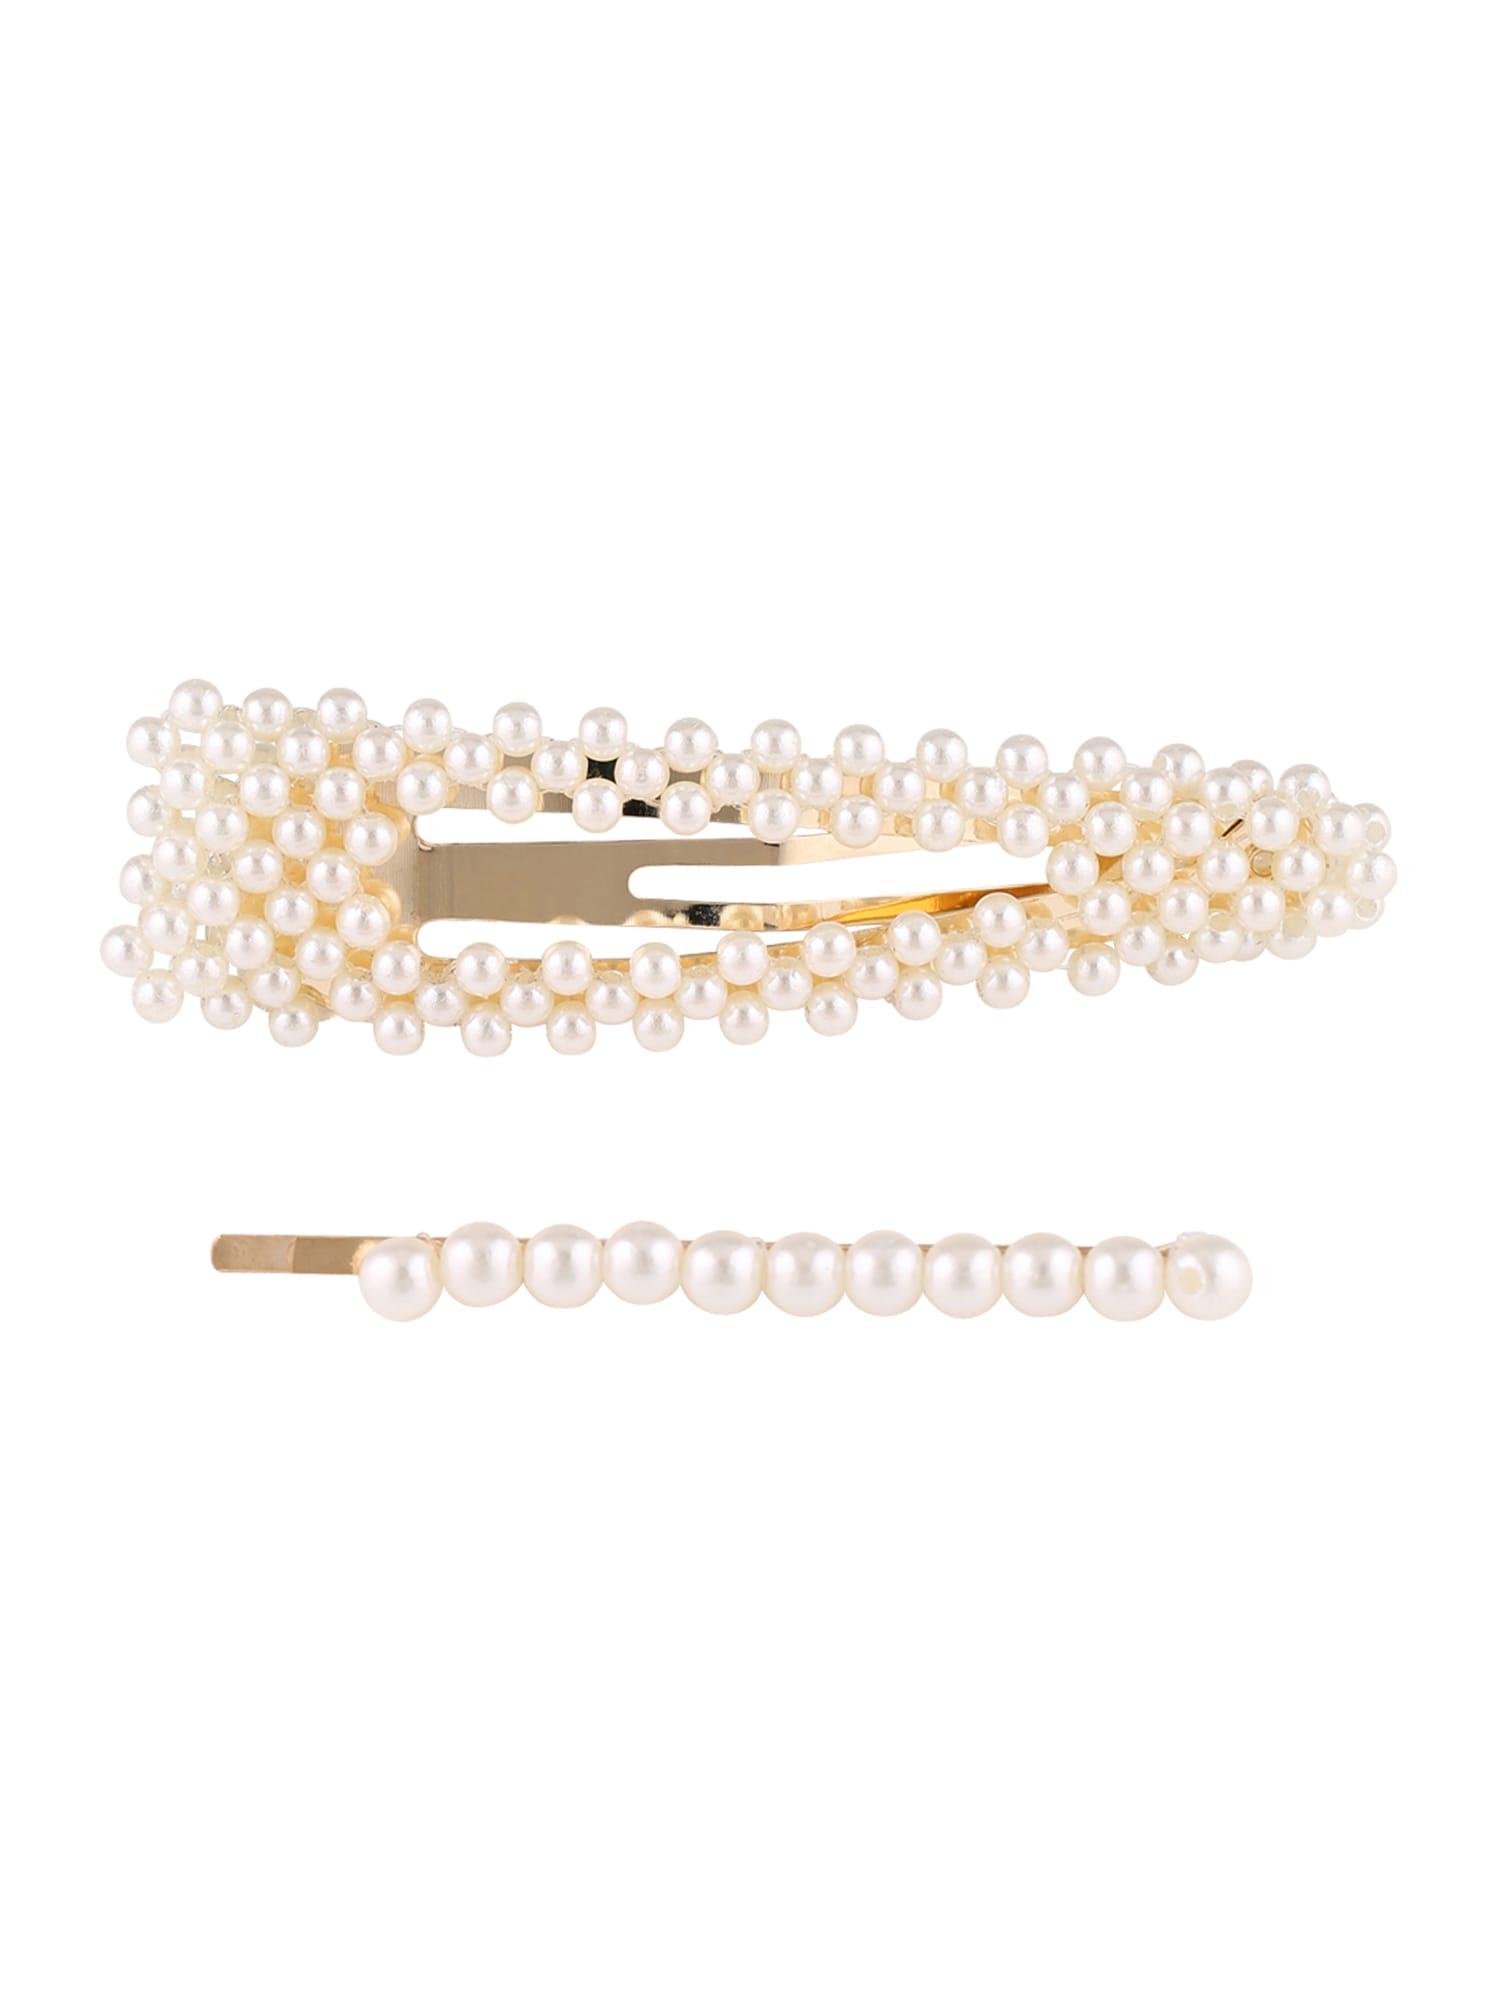 Šperky do vlasů Ocean Pearl Clip Silver Single Pearl Needle bílá perlově bílá We Are Flowergirls